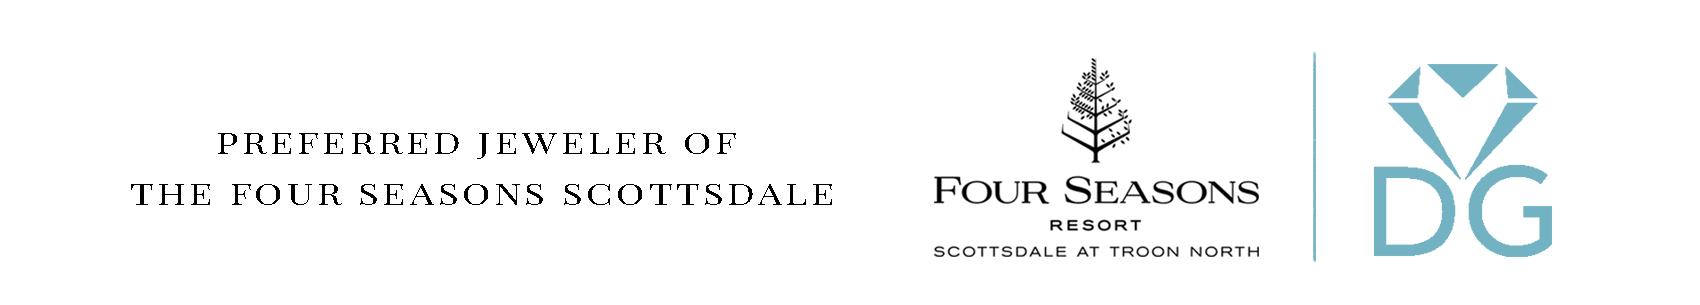 Four Seasons Banner - Desktop View